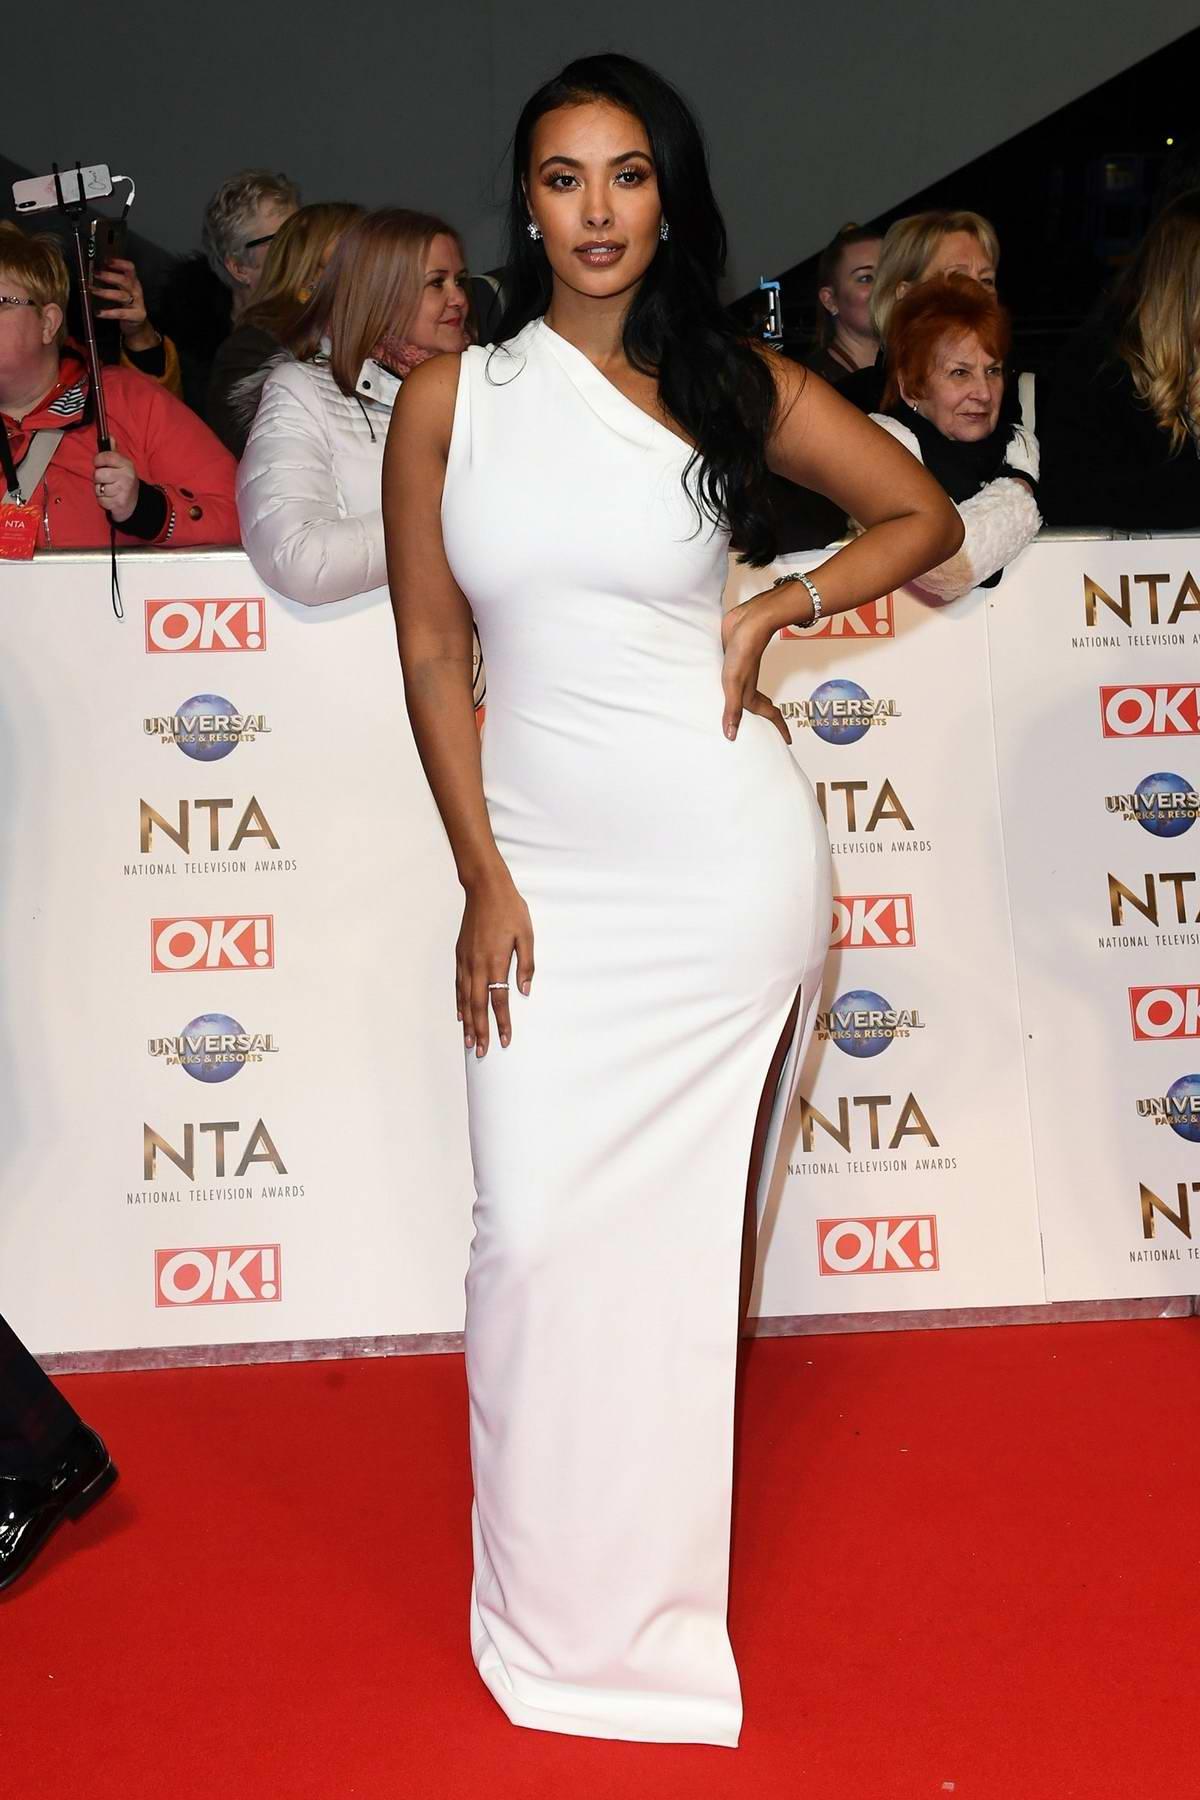 Maya Jama attends the National Television Awards 2020 at The O2 Arena in London, UK